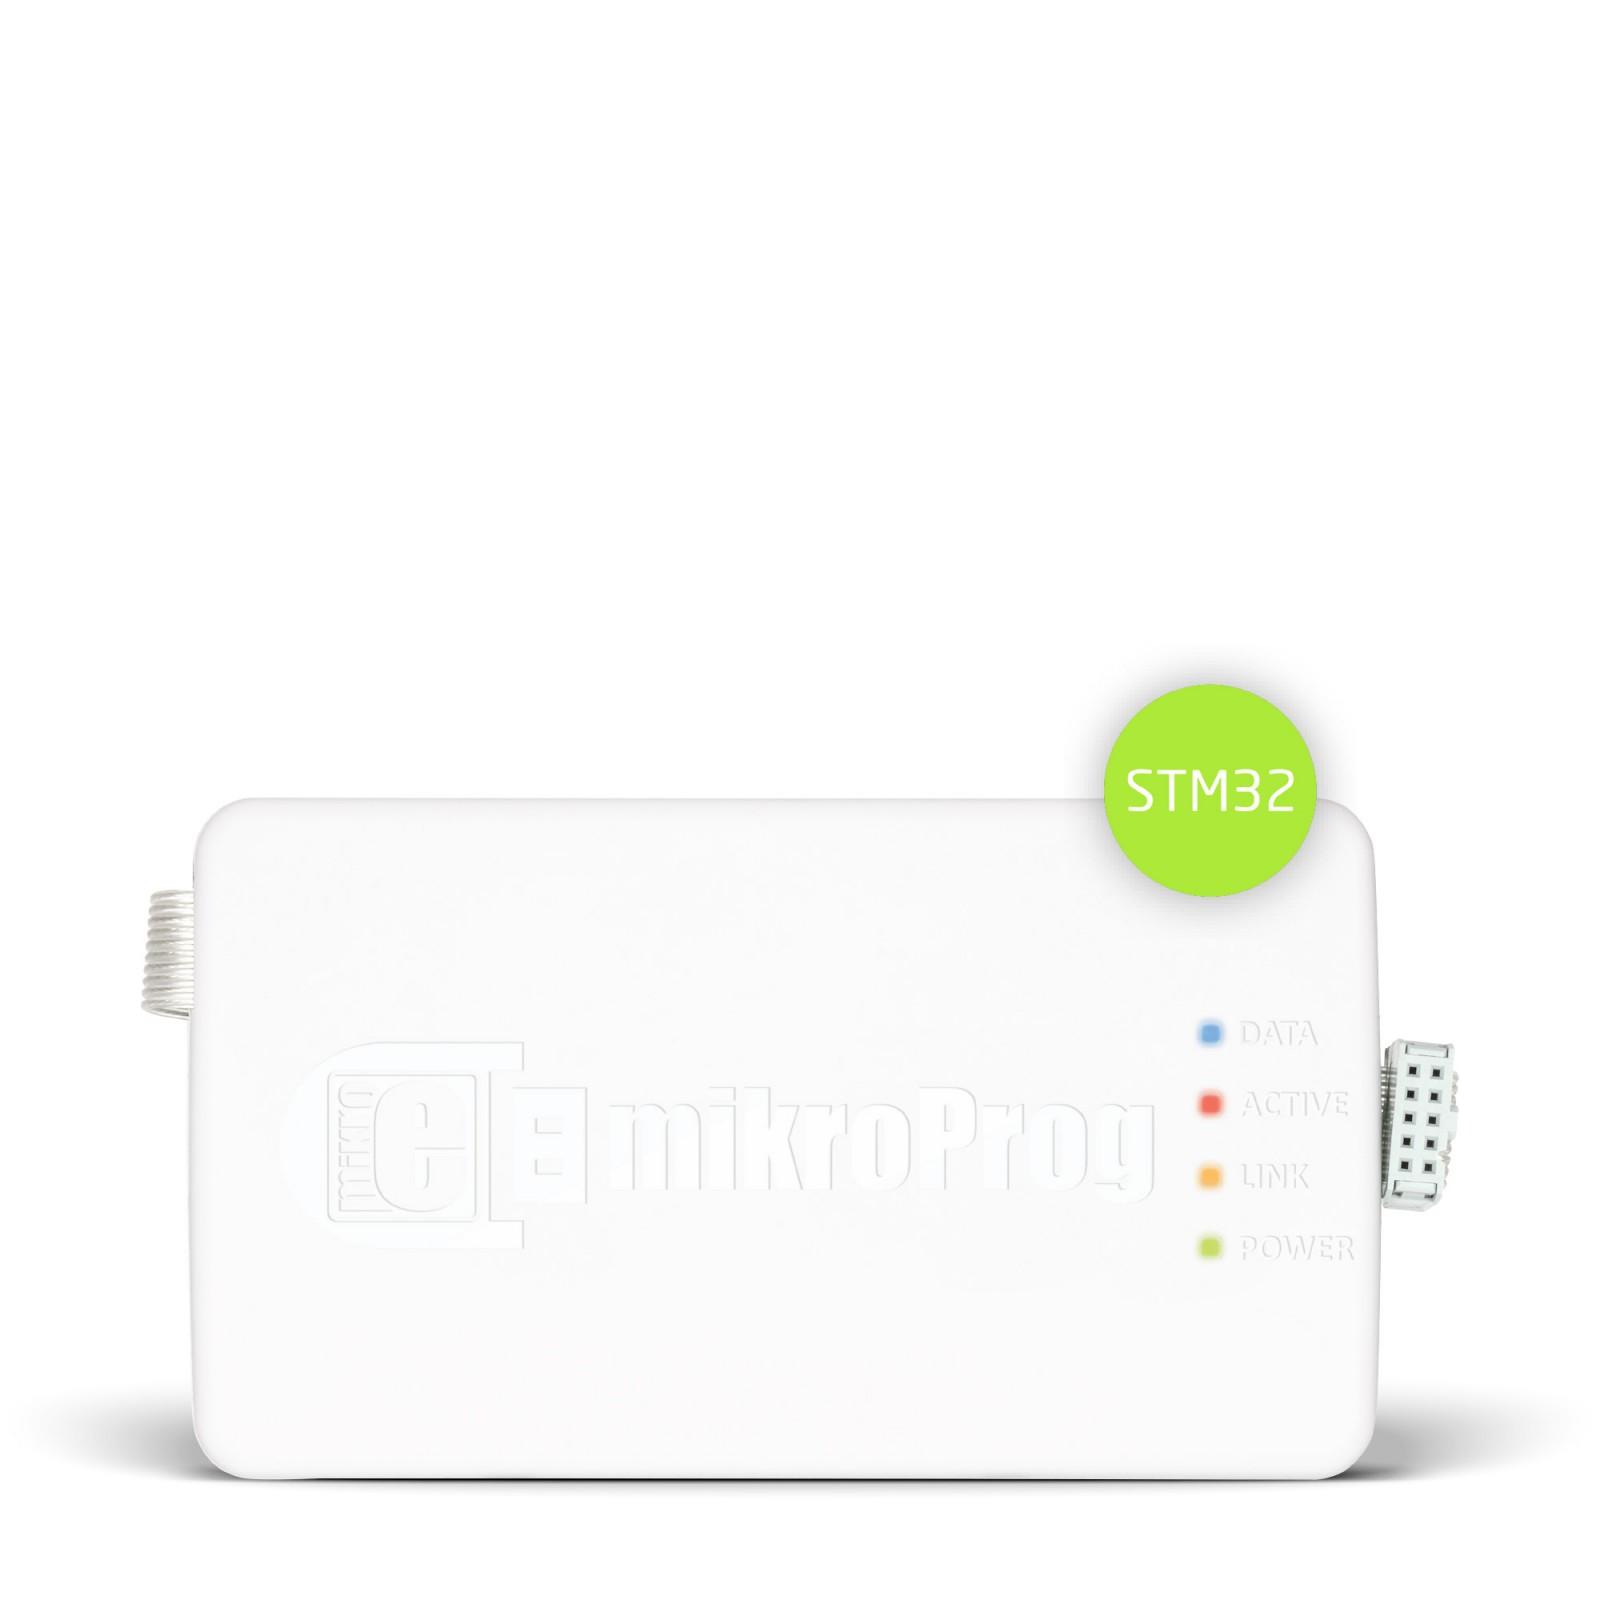 mikroProg for STM32 - ARM Cortex-M USB 2 0 Programmer / Debugger